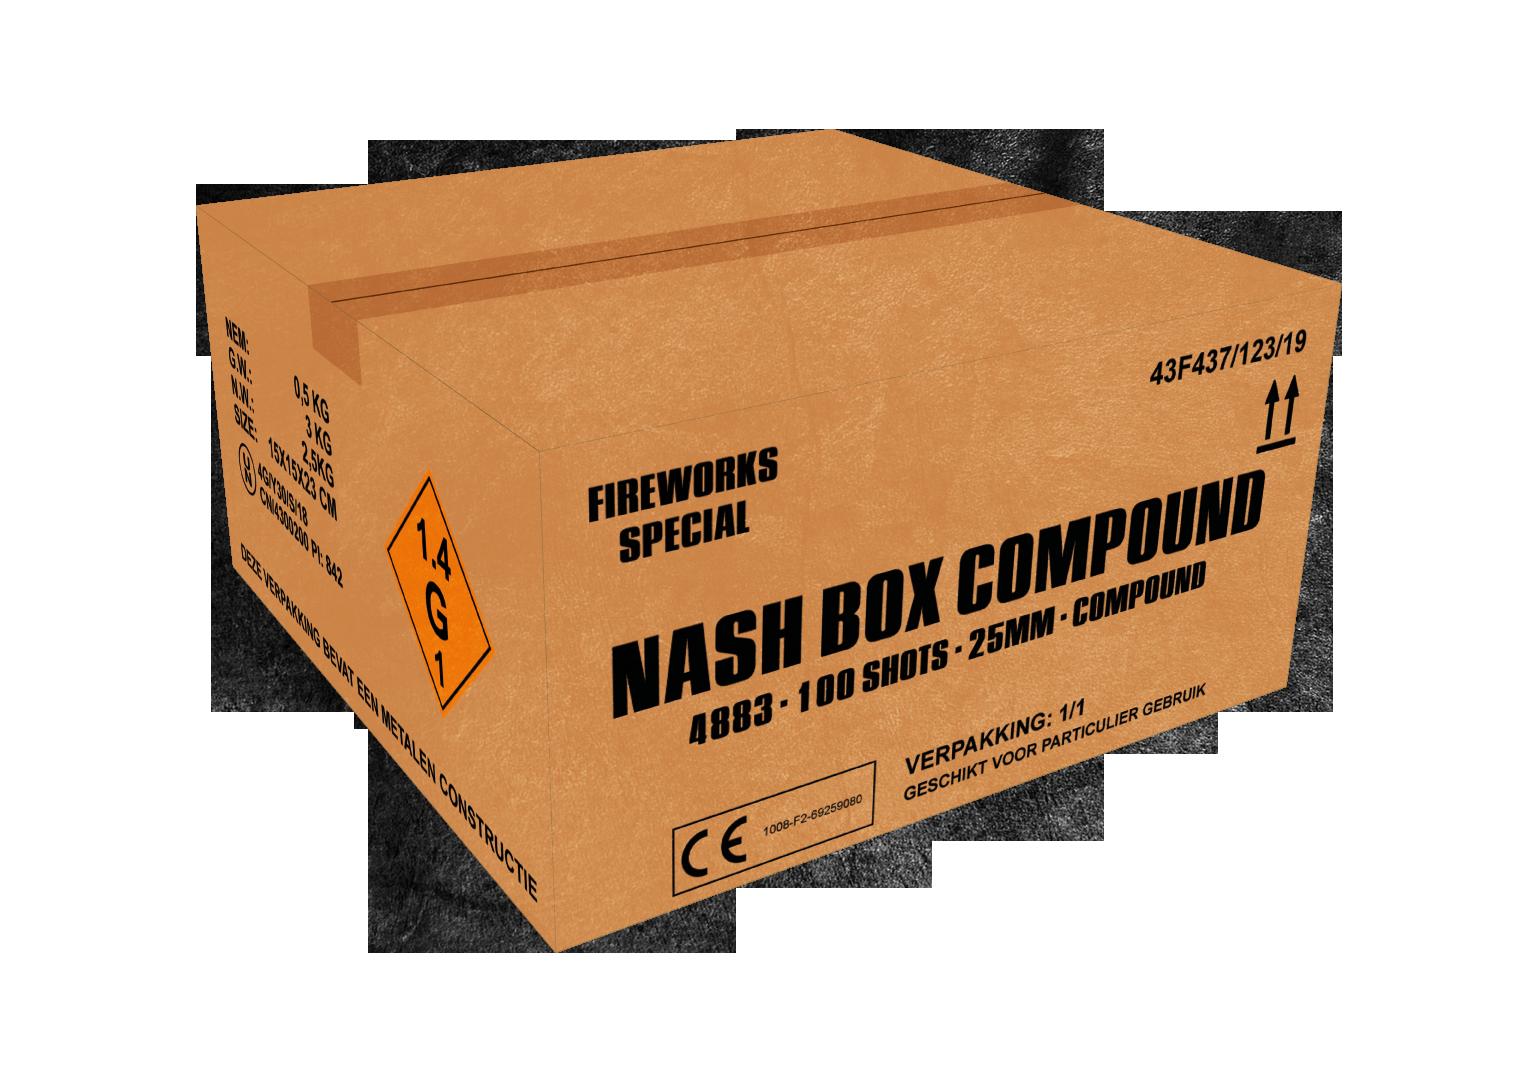 ART. 4883 NASH BOX, 100 SHOTS 25 MM COMPOUND